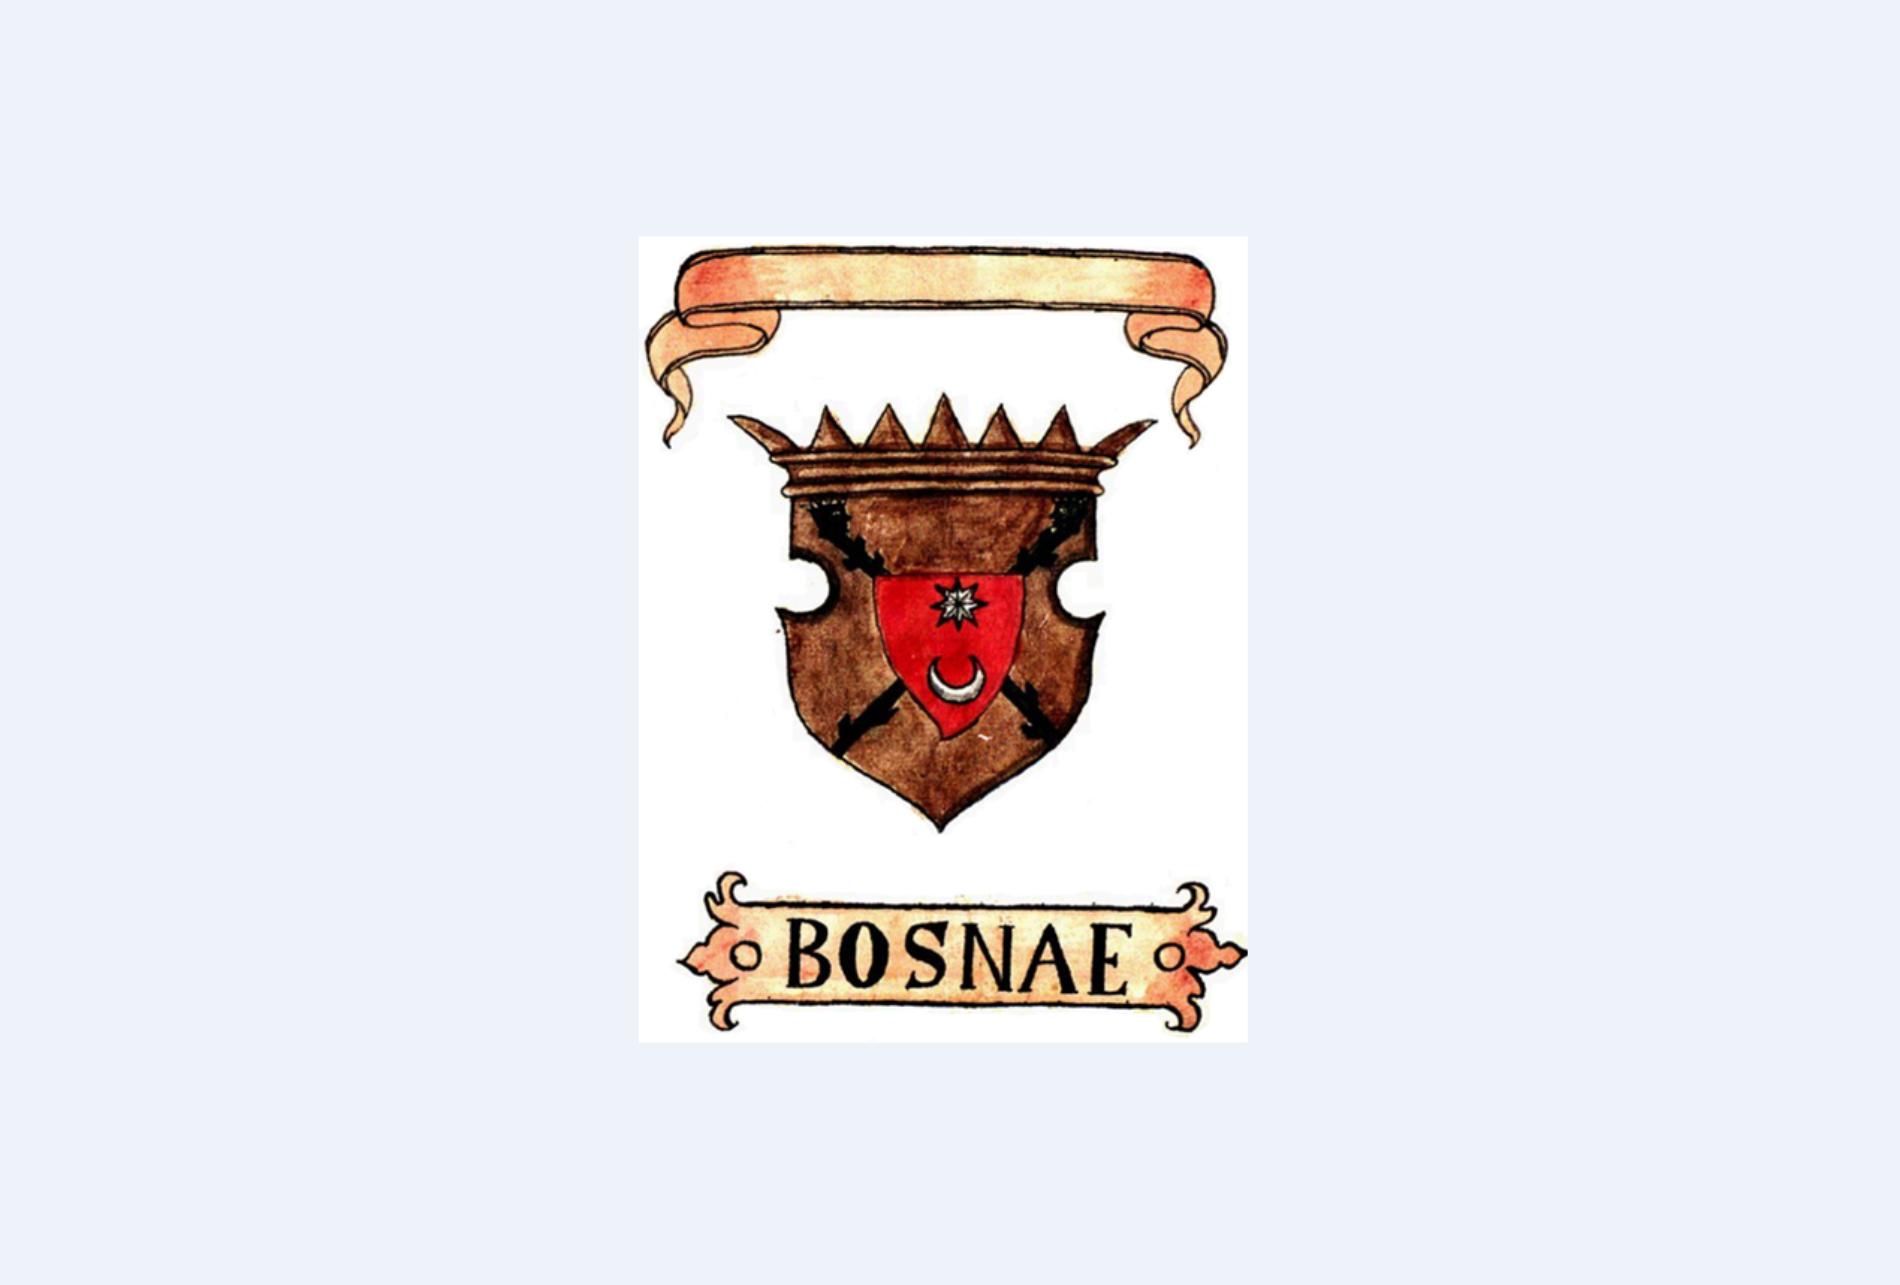 Bosna – Ilirska i gotska komponenta dominantnije od slavenske